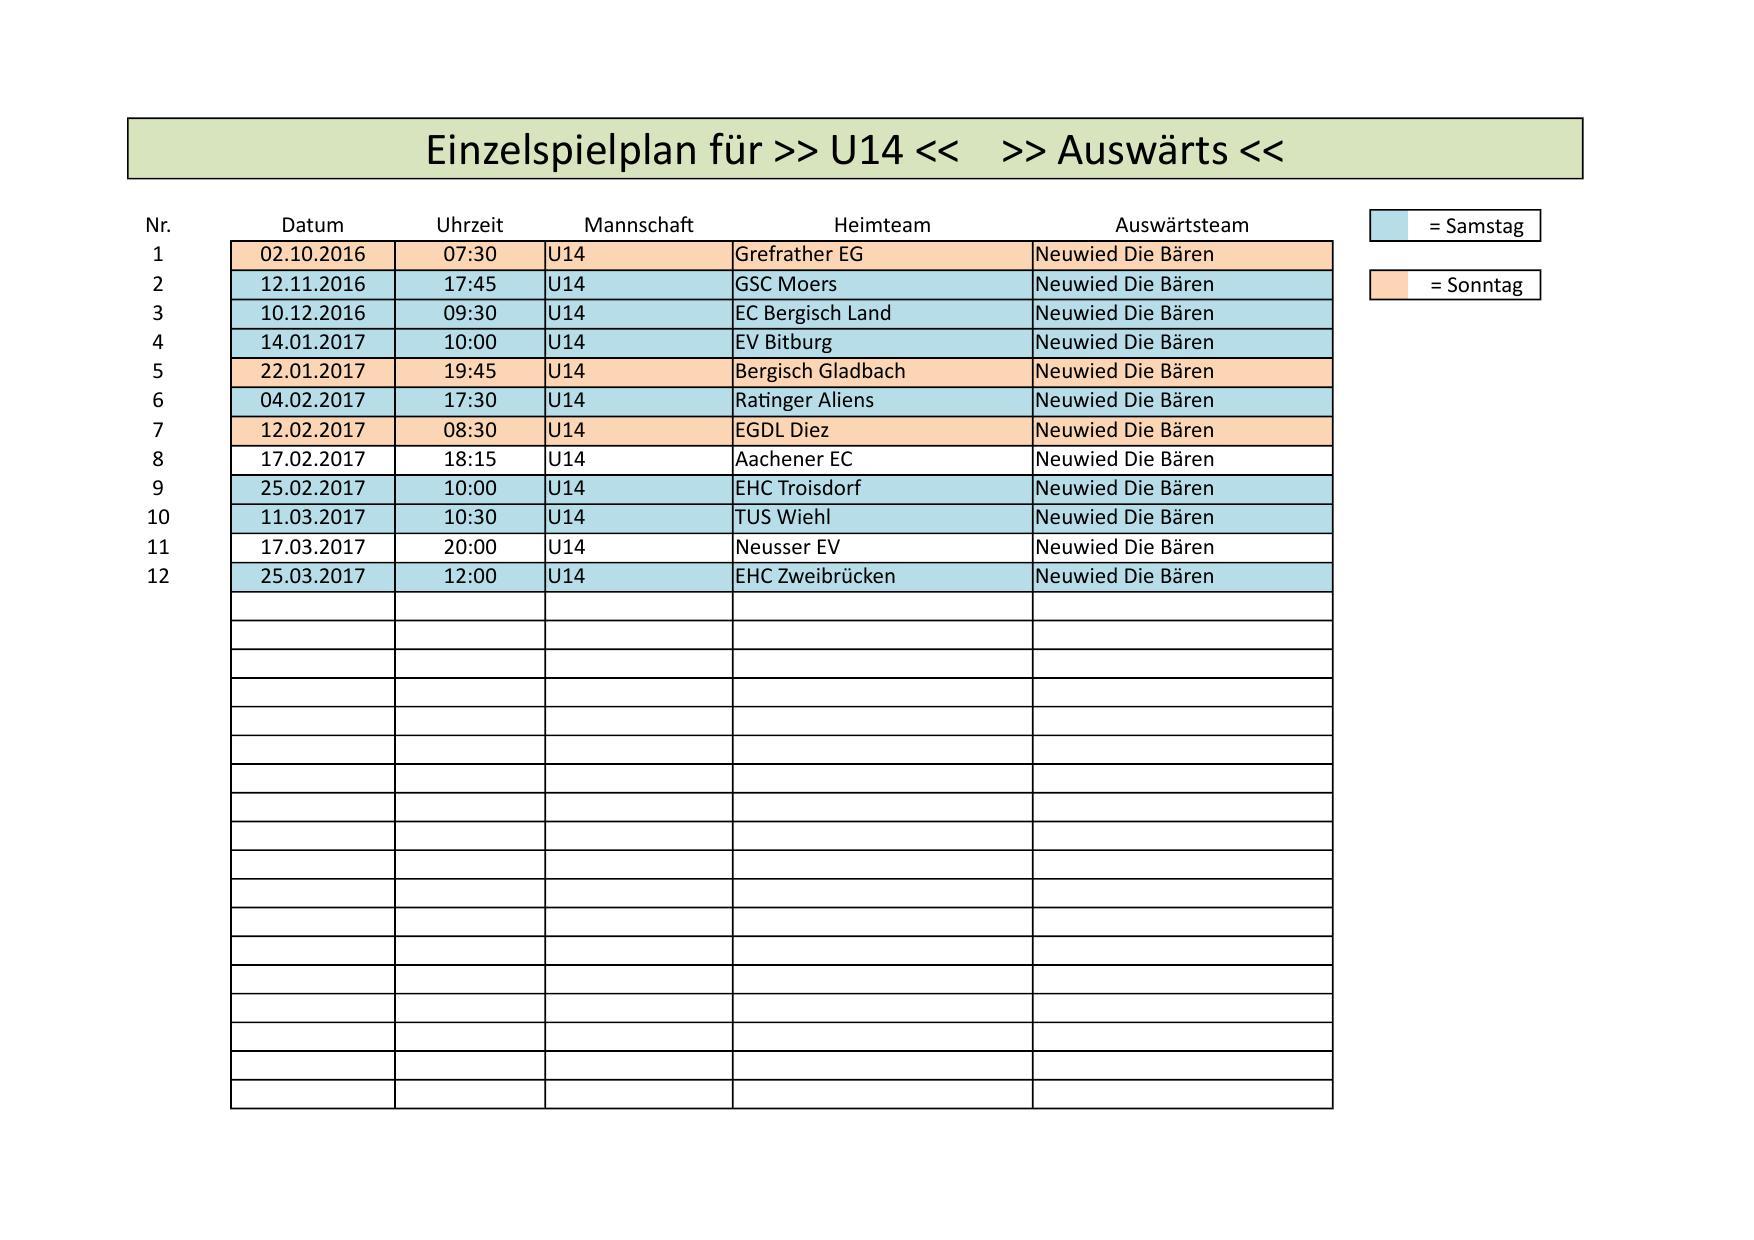 u14_auswaerts-pdf_000002